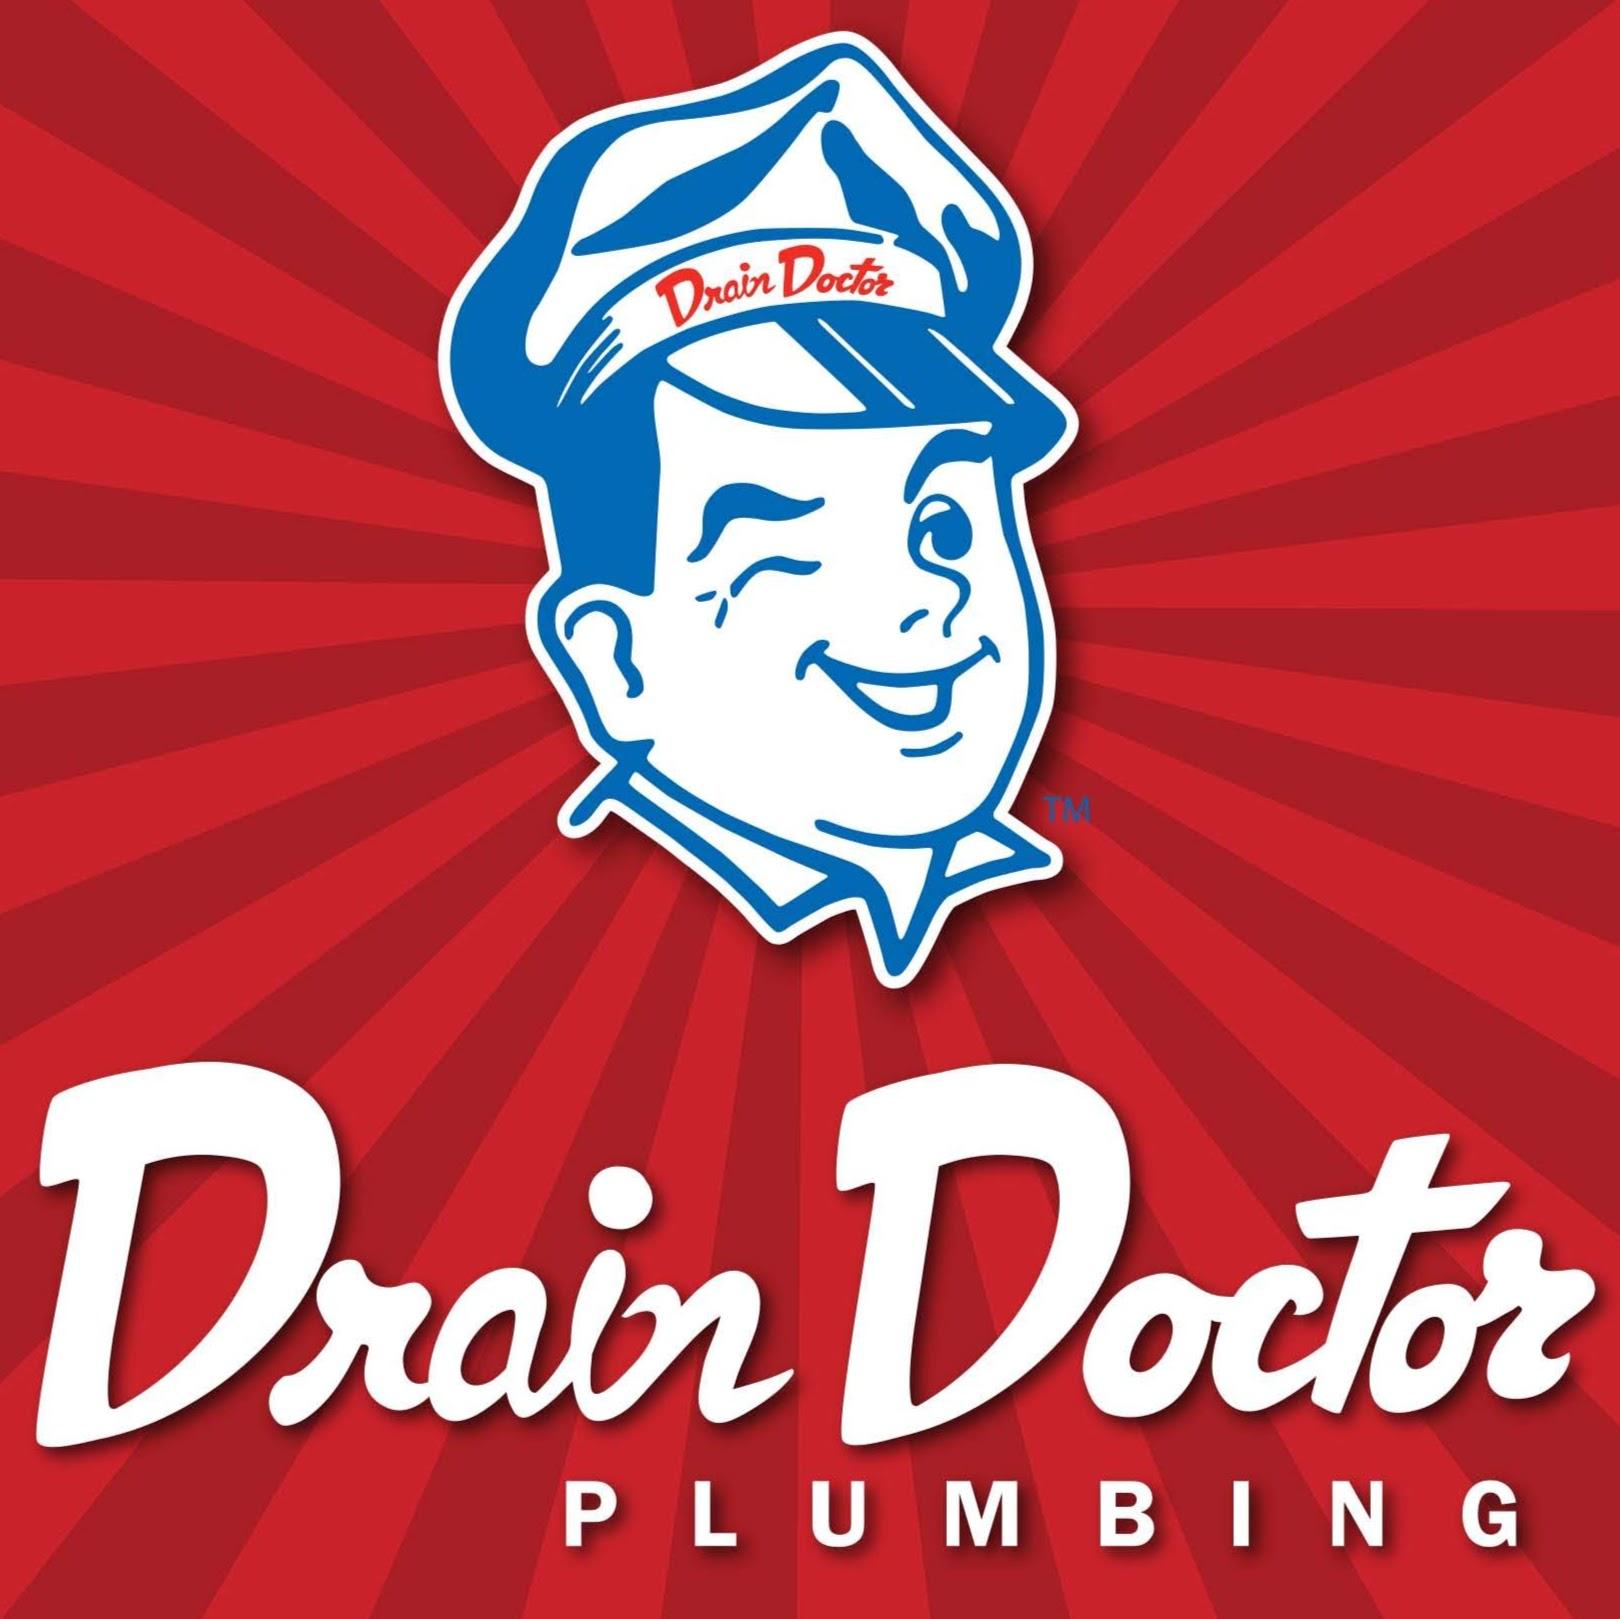 Drain Doctor Plumbing Ayrshire And Glasgow South | Troon KA10 7AR | +44 800 068 1958